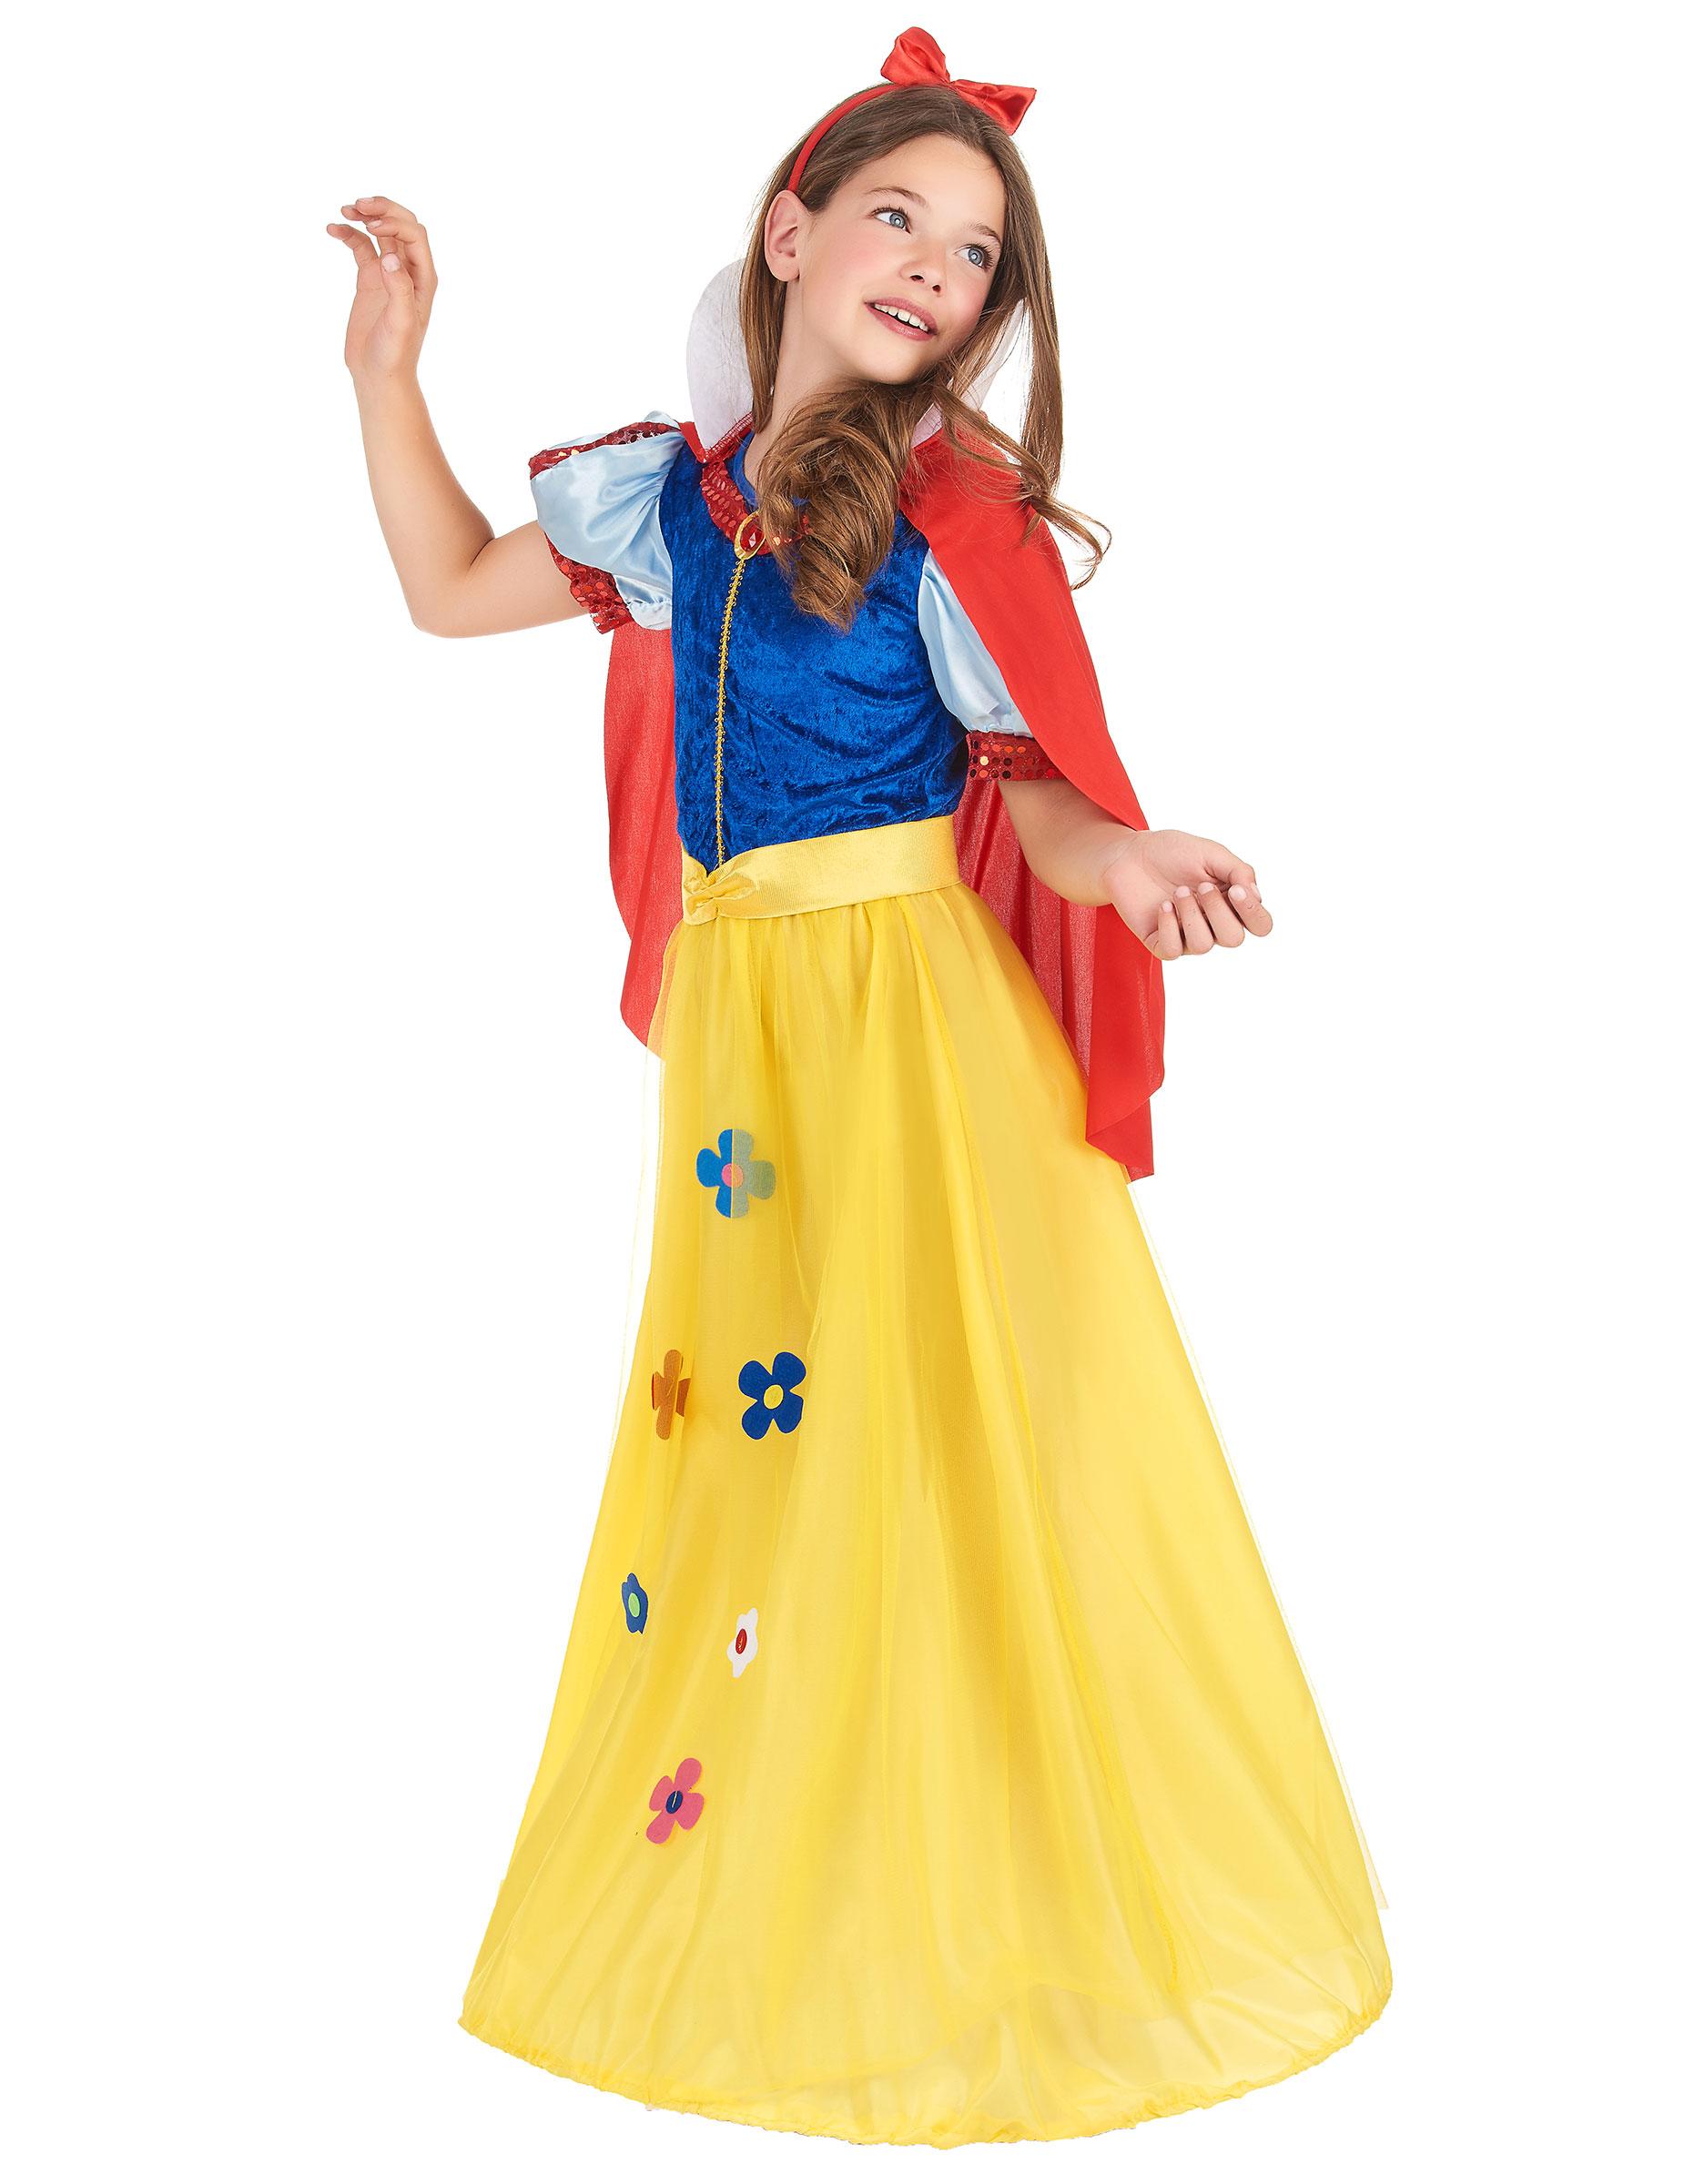 Favorito Costume da principessa bambina AS83